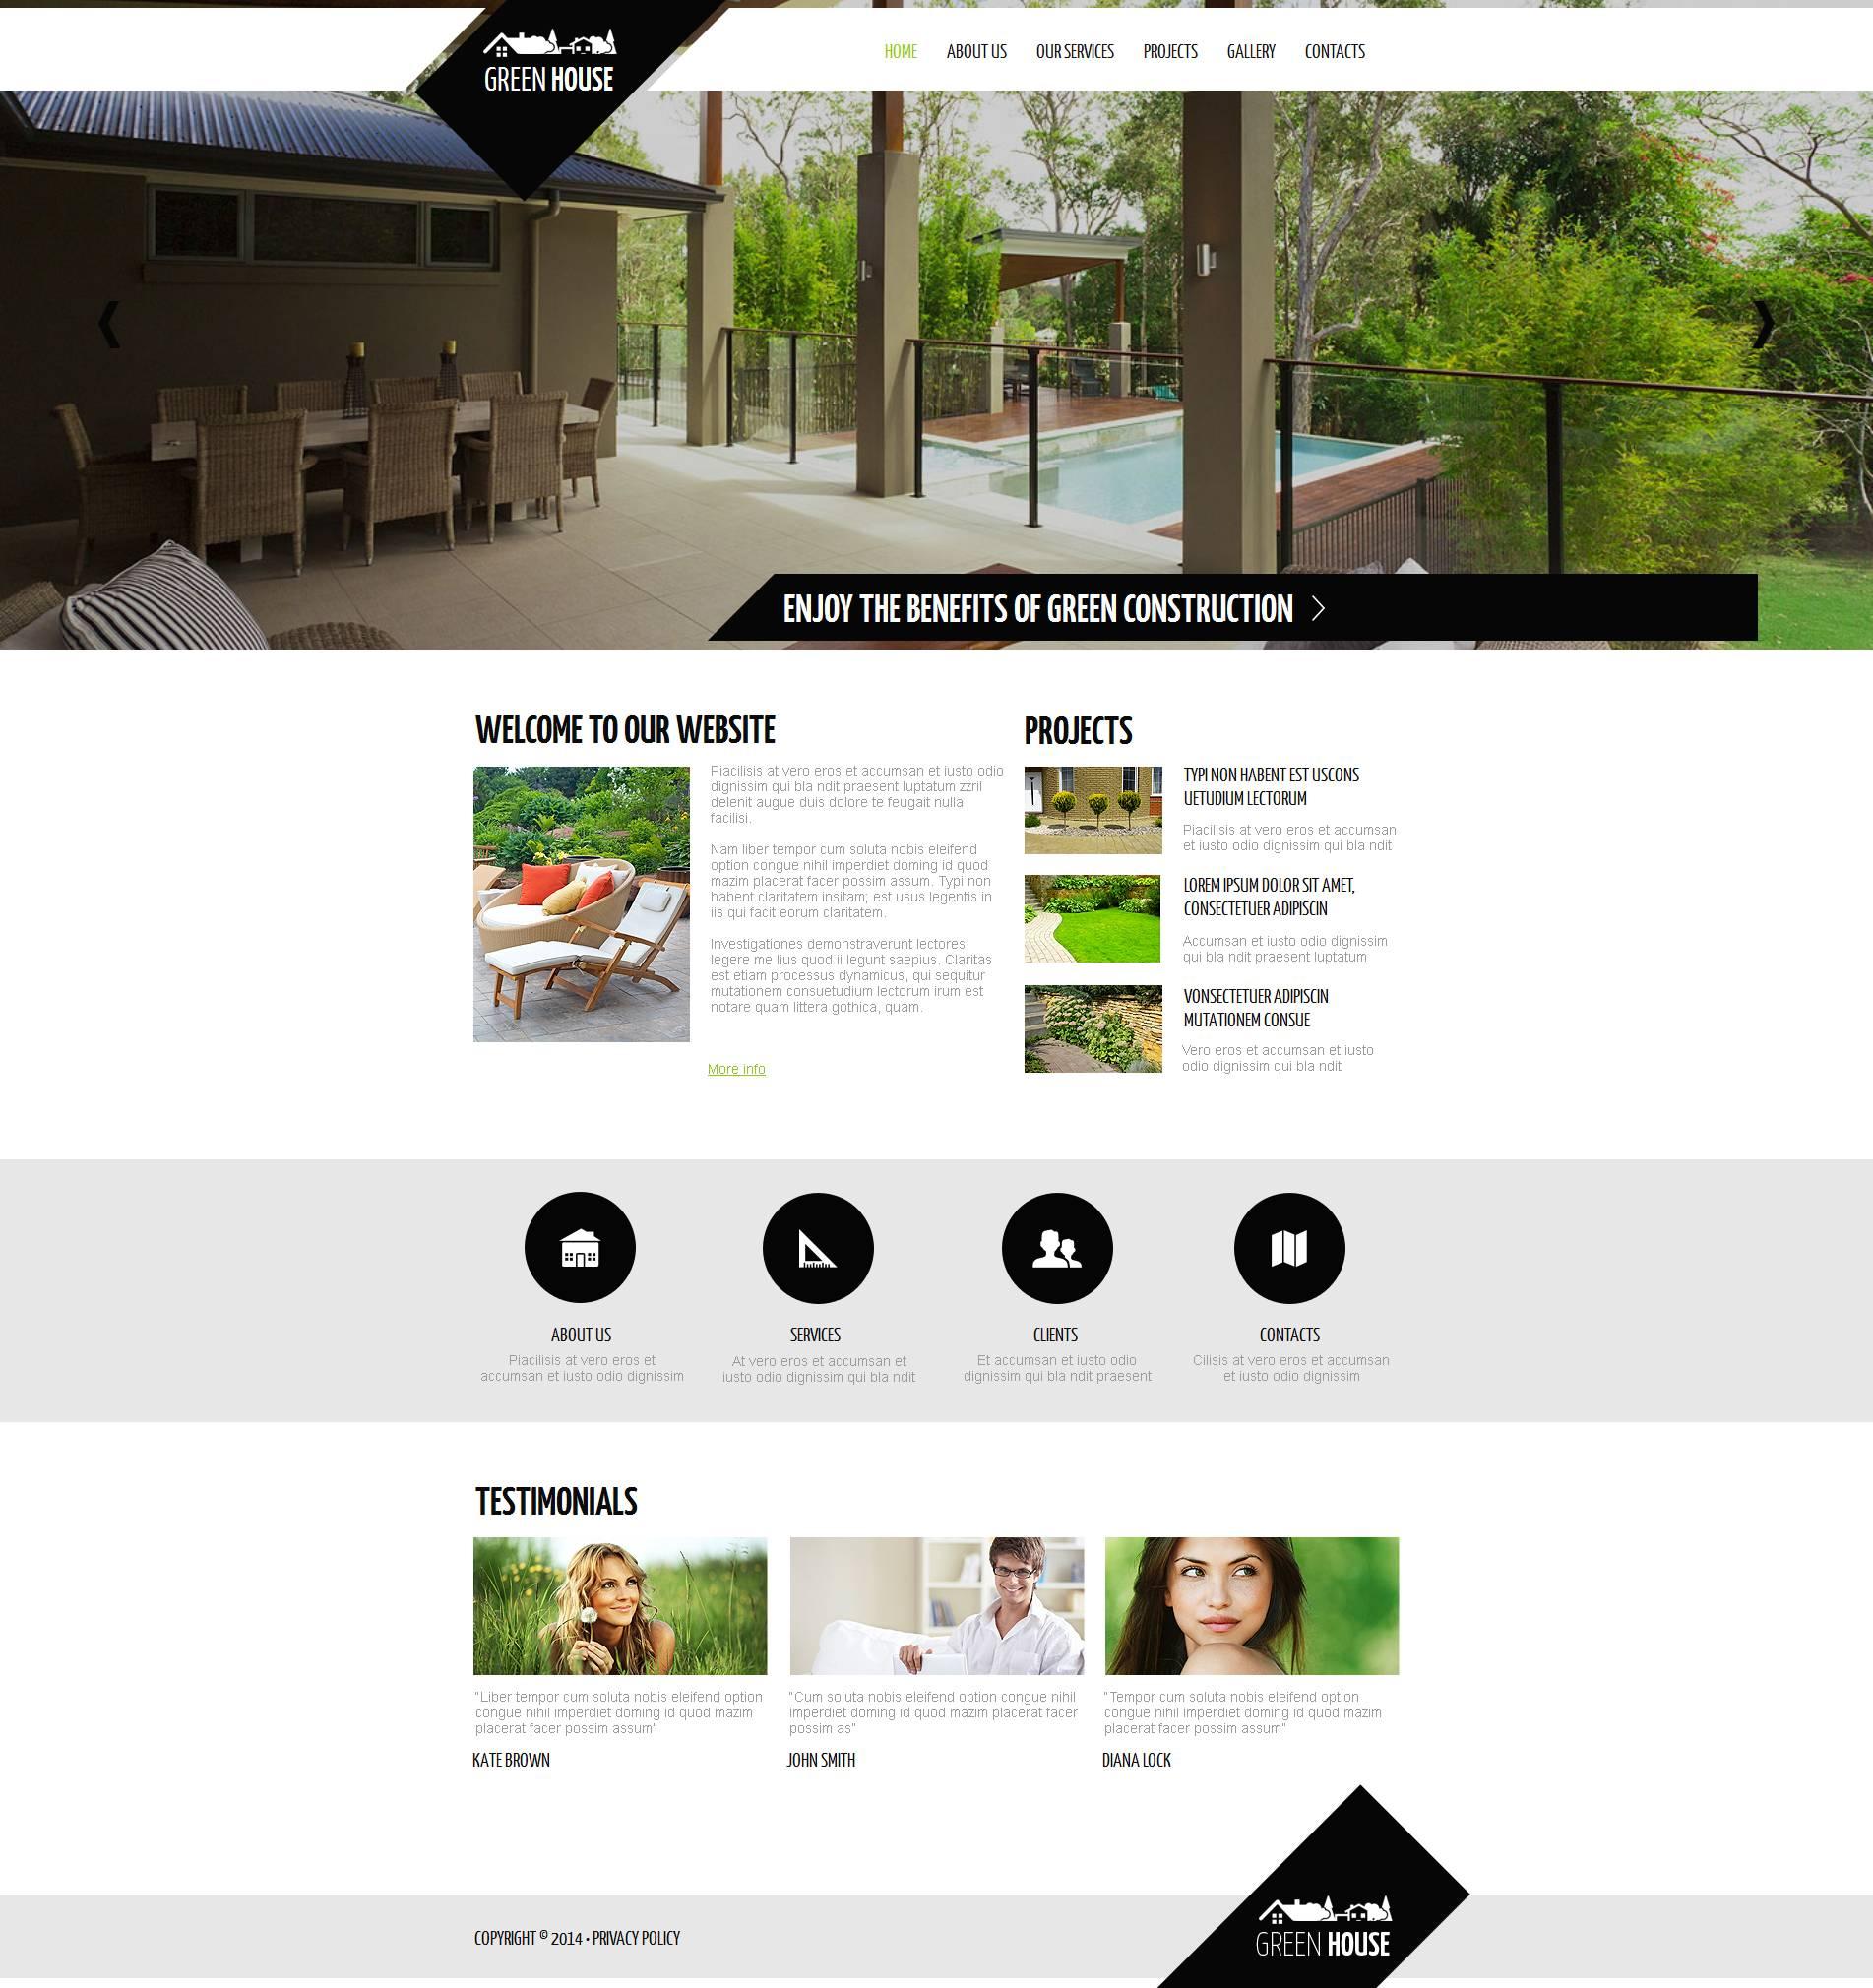 Szablon Moto CMS HTML #48866 na temat: architektura krajobrazu - zrzut ekranu